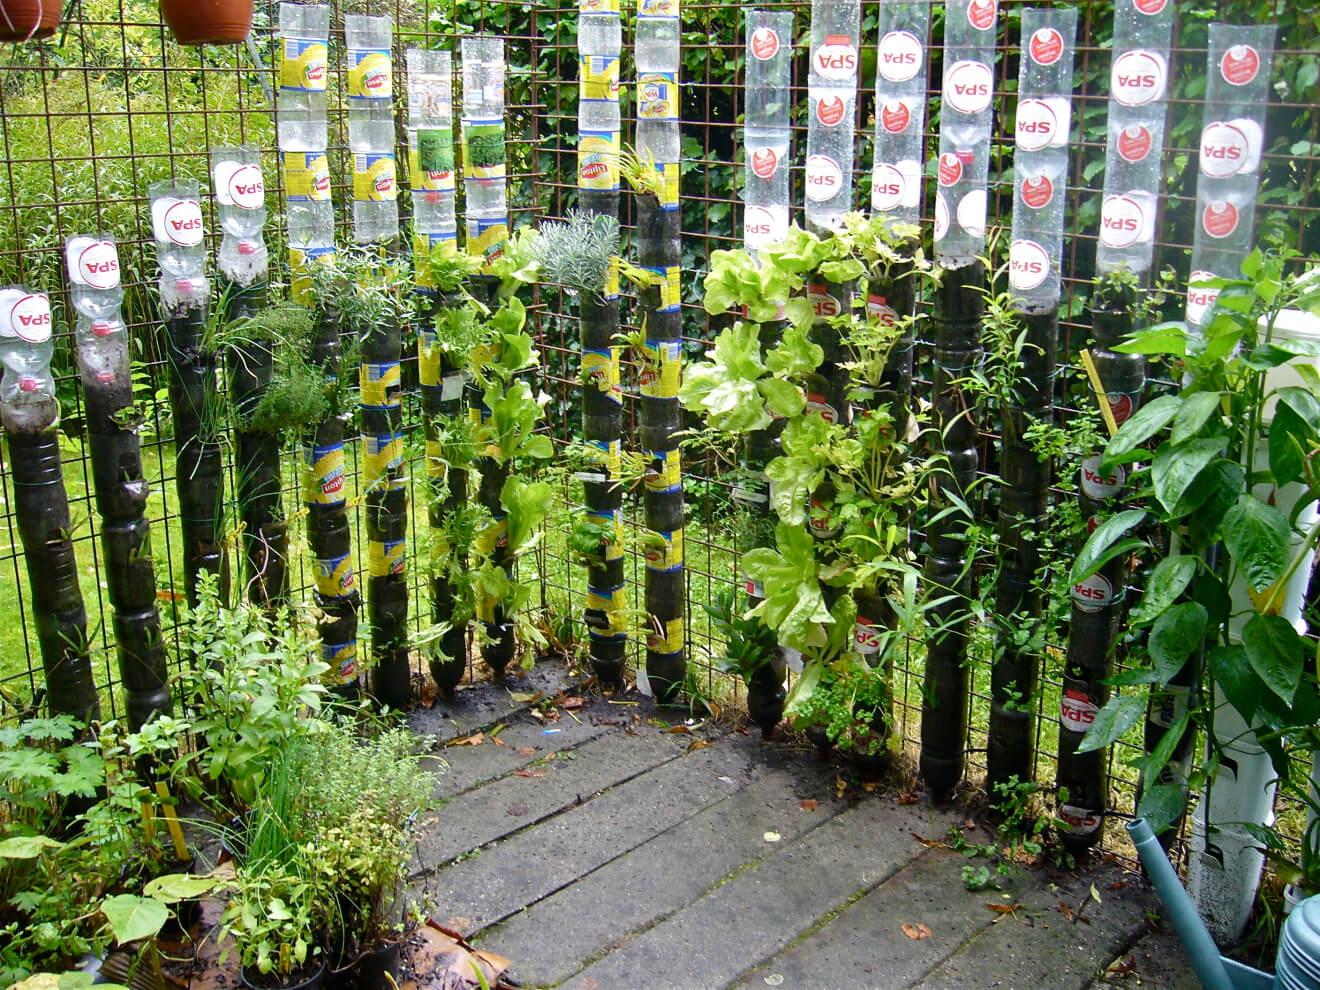 DIY Vertical Plastic Bottle Tower Gardening 19